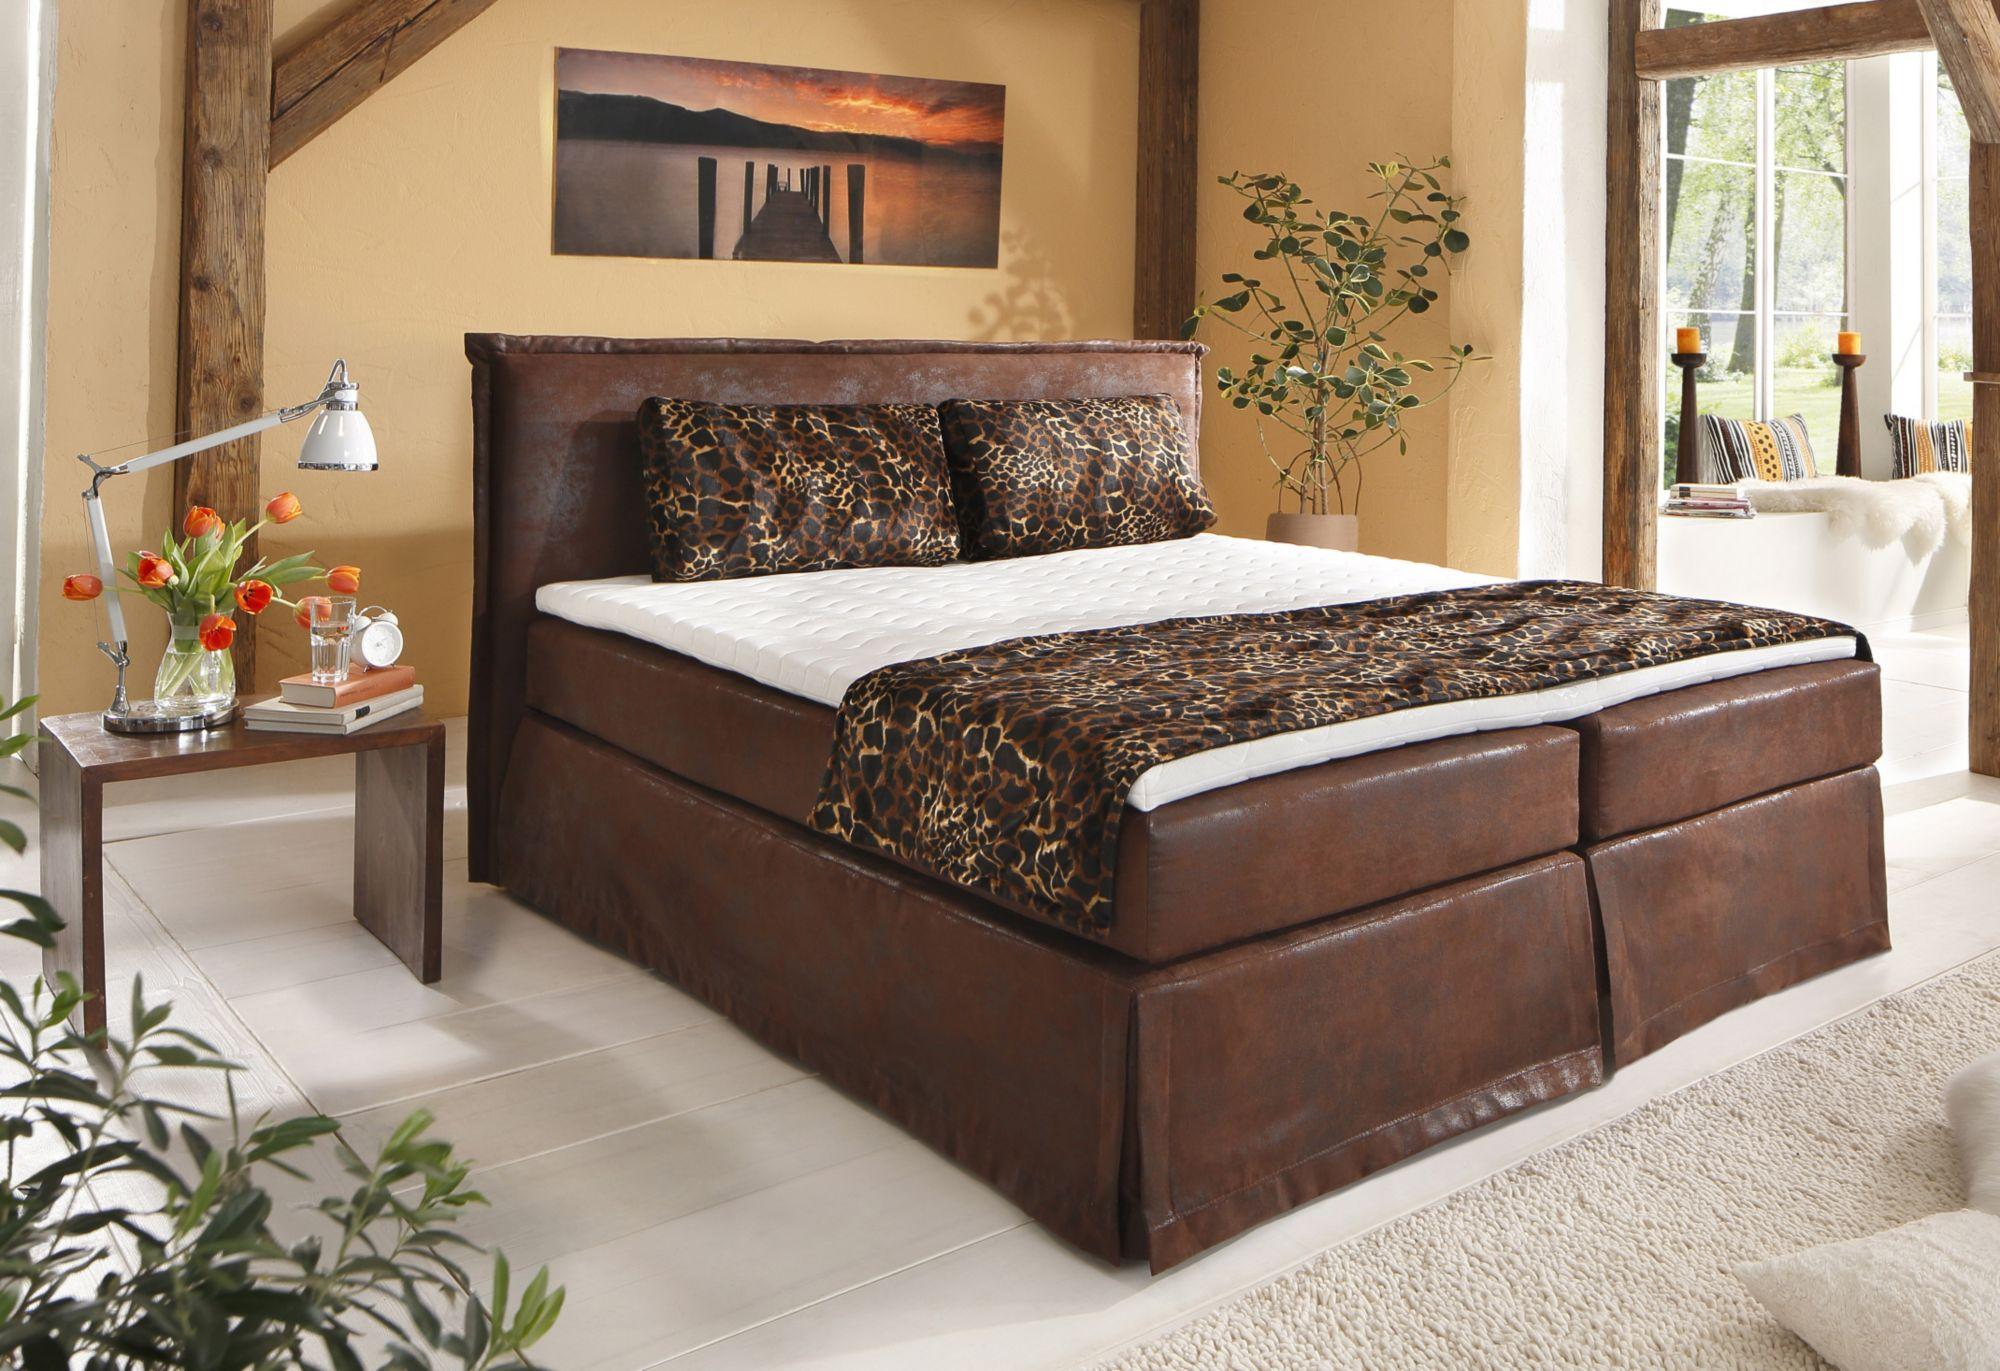 boxspringbett inkl topper home affaire brighton schwab versand bettgestelle. Black Bedroom Furniture Sets. Home Design Ideas